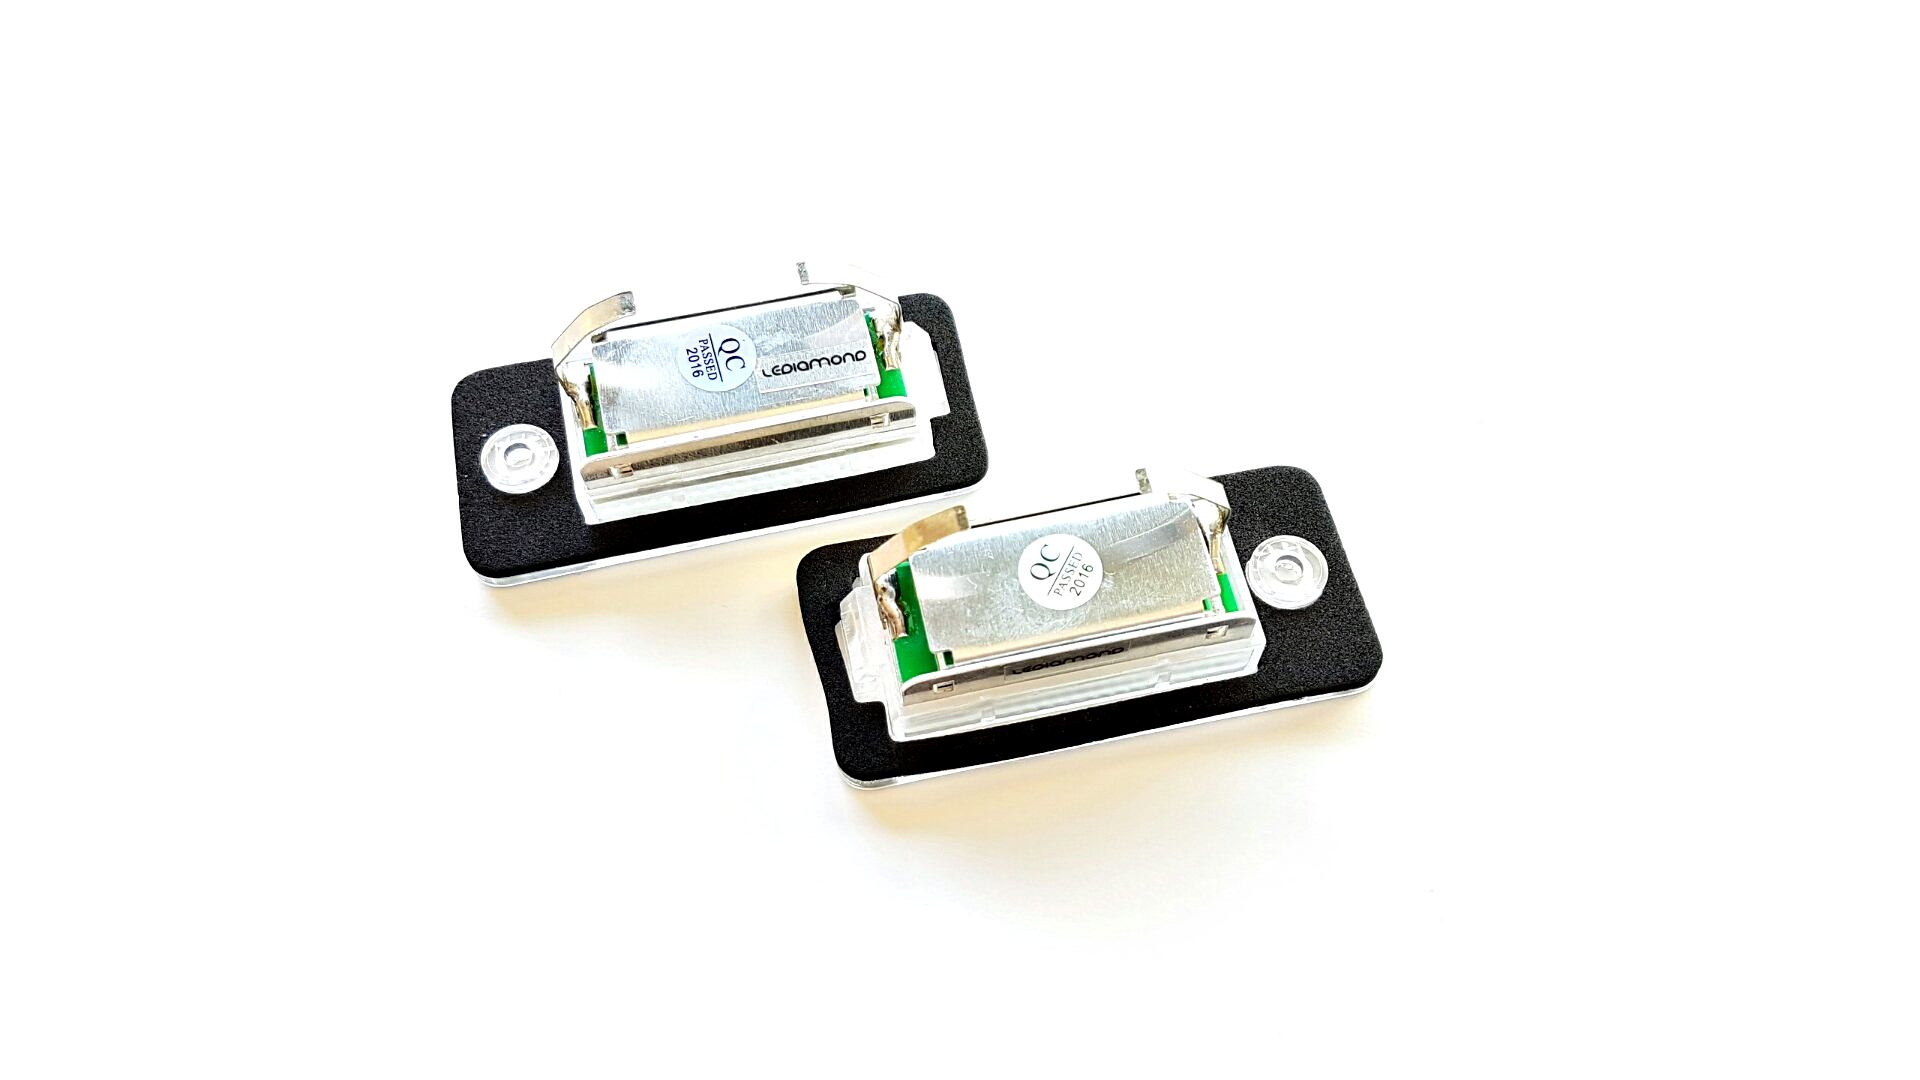 PLAFONES MATRICULA LED AUDI A3 A4 A5 A6 A8 Q7 RS4 LEDIAMOND LMD030804 (2)